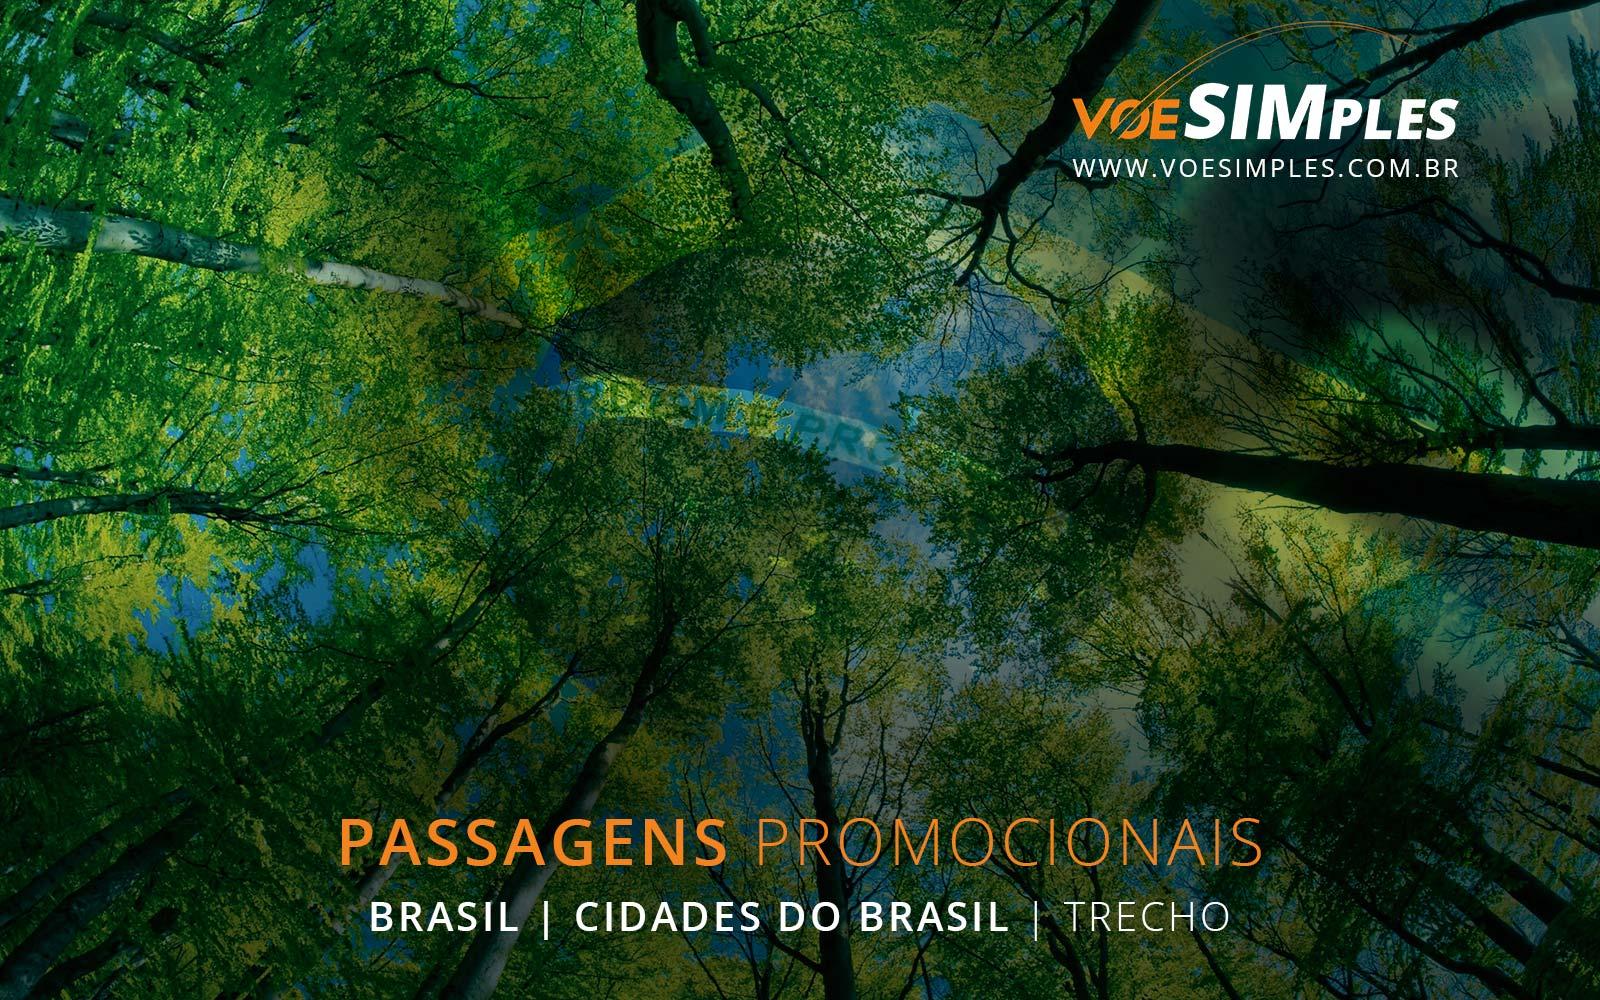 passagens-aereas-promocionais-brasil-voe-simples-passagem-aerea-promocional-barata-promocao-passagem-aviao-passagens-aereas-brasil-diversos-destinos-trecho